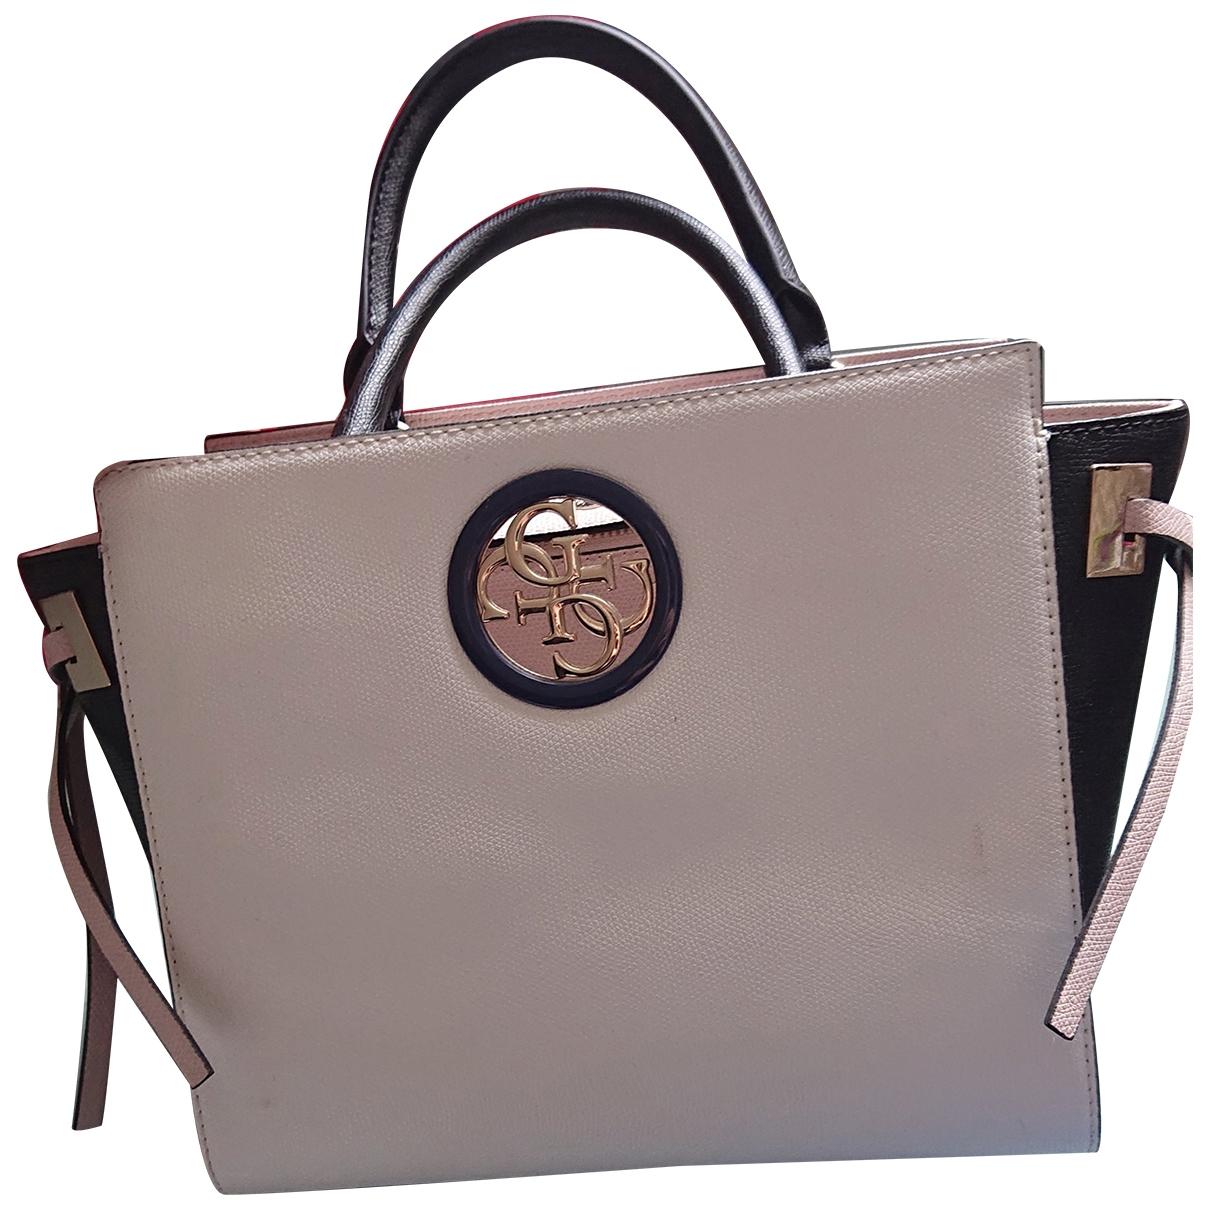 Guess \N Handtasche in  Schwarz Leder